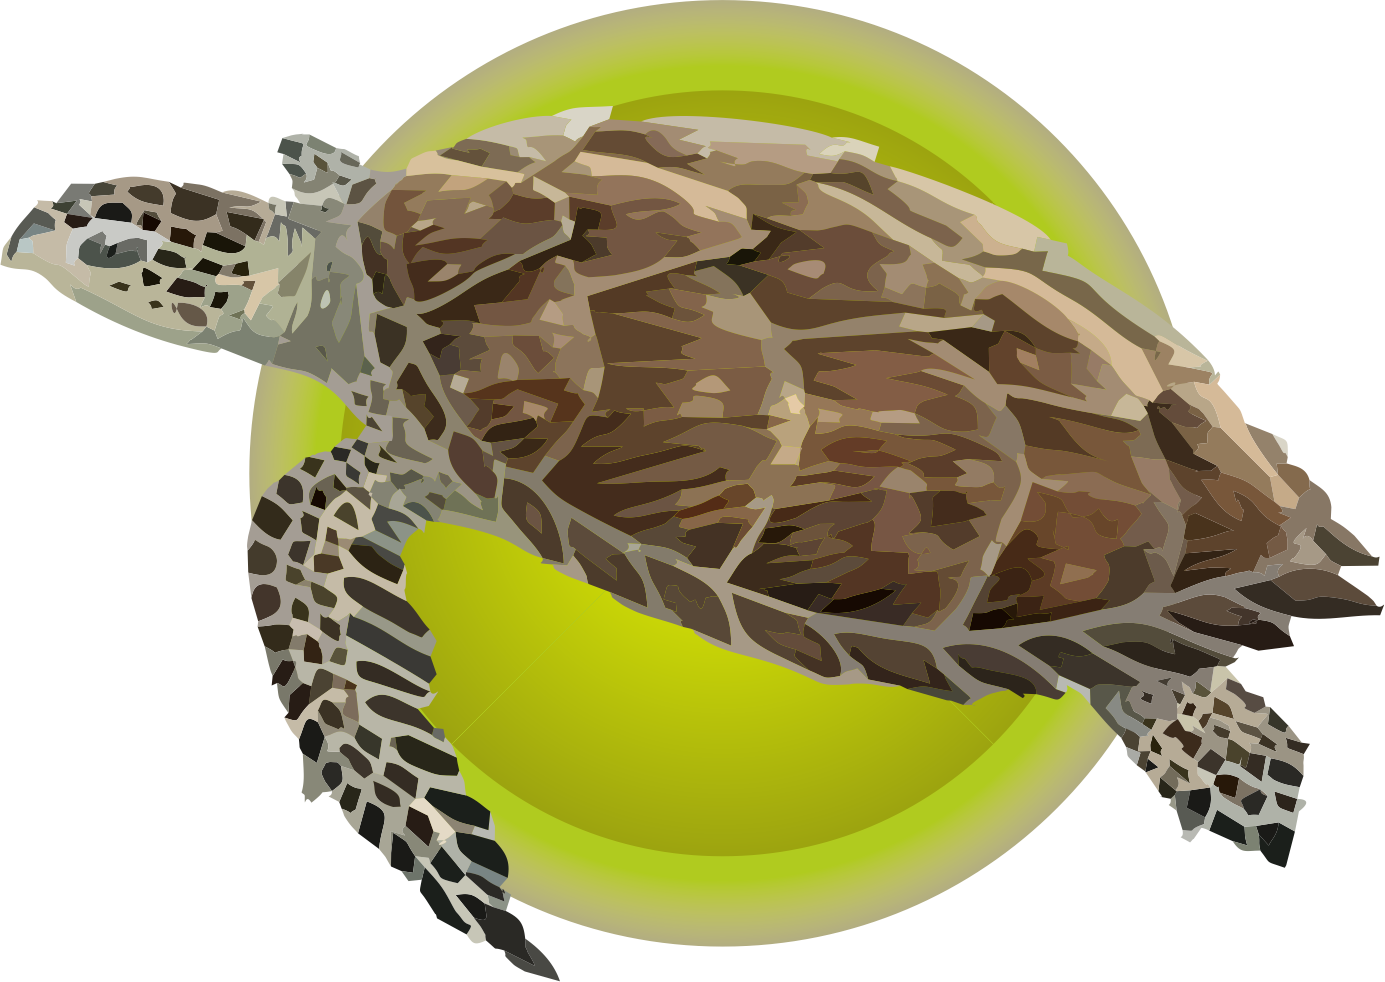 Tortuga Carey (Eretmochelys Imbricata)